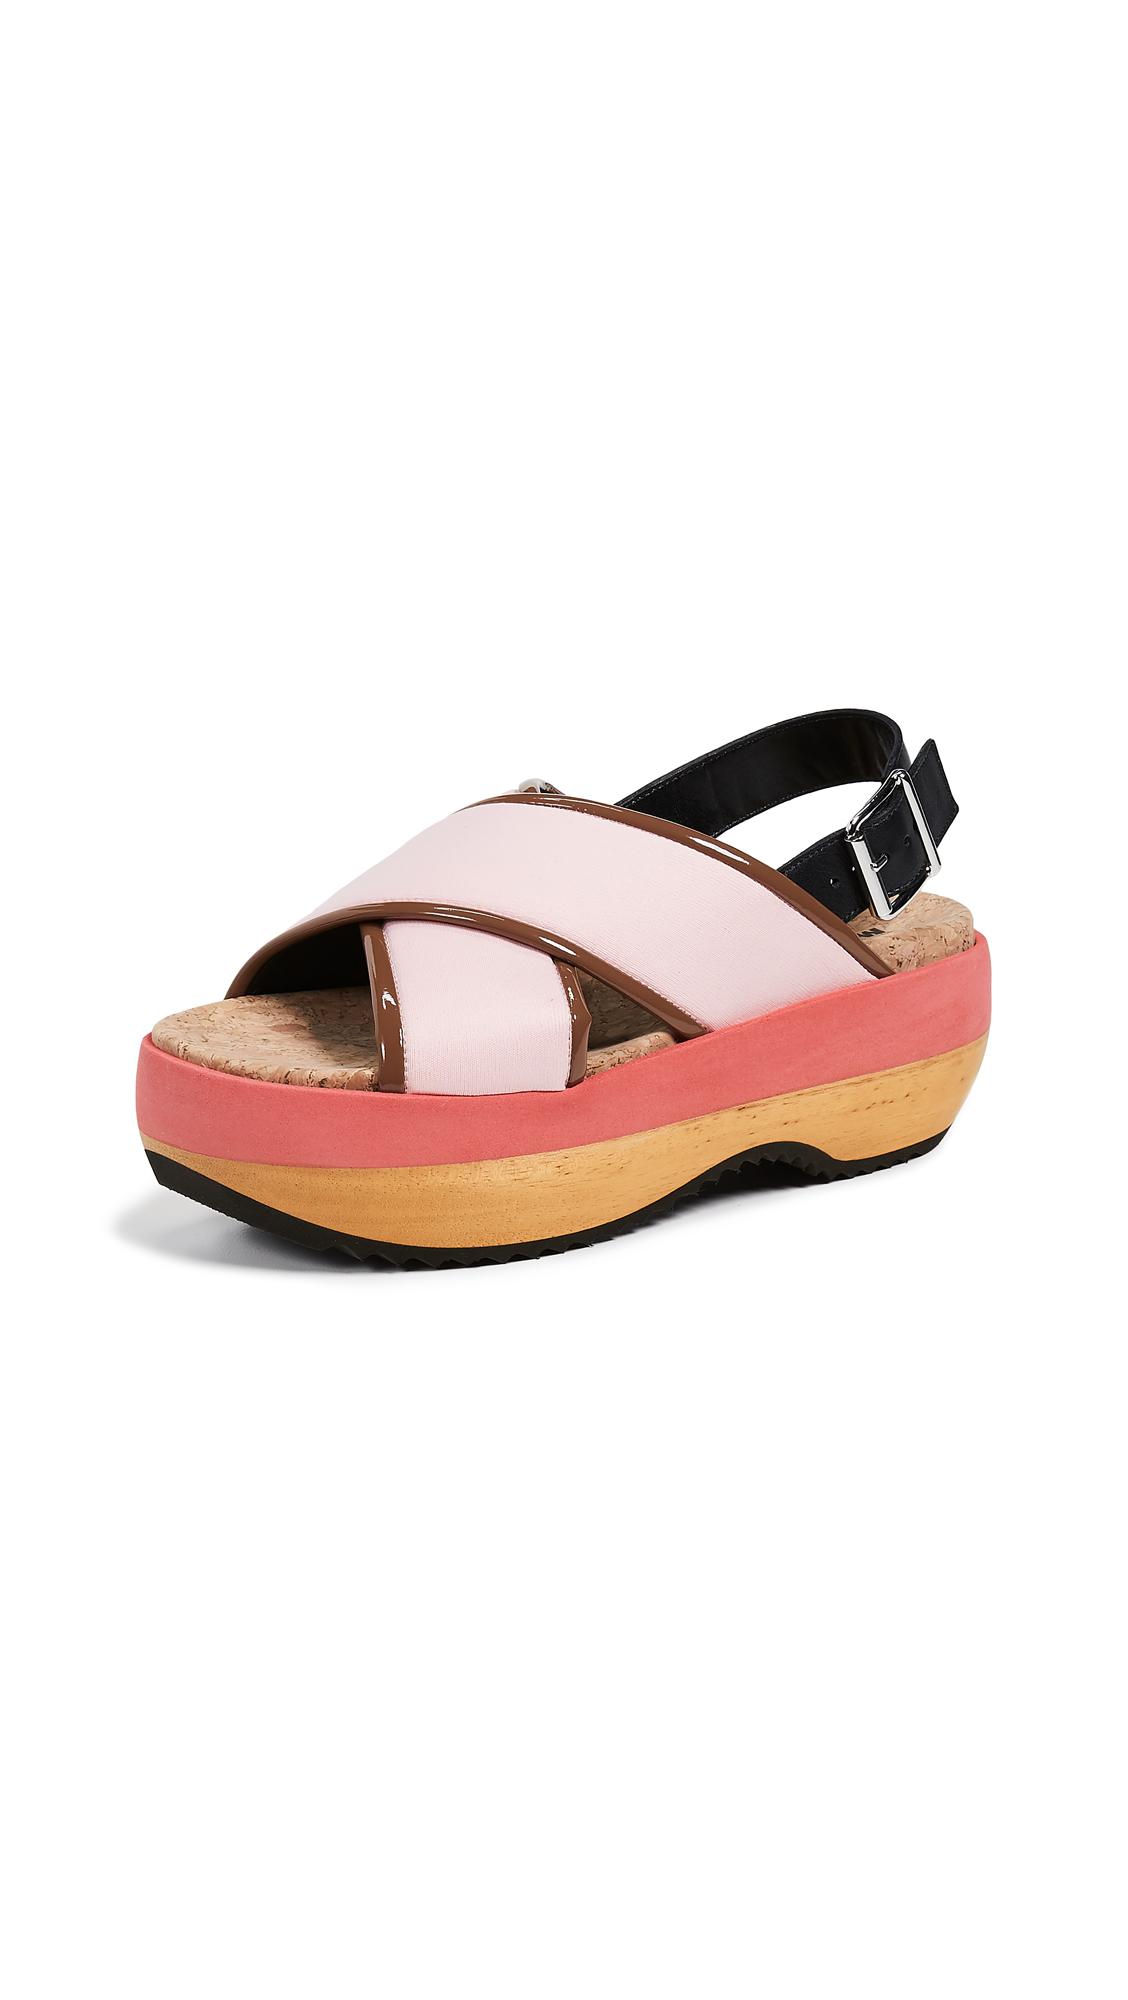 Marni Wedge Crisscross Sandals - Light Pink/Marmot